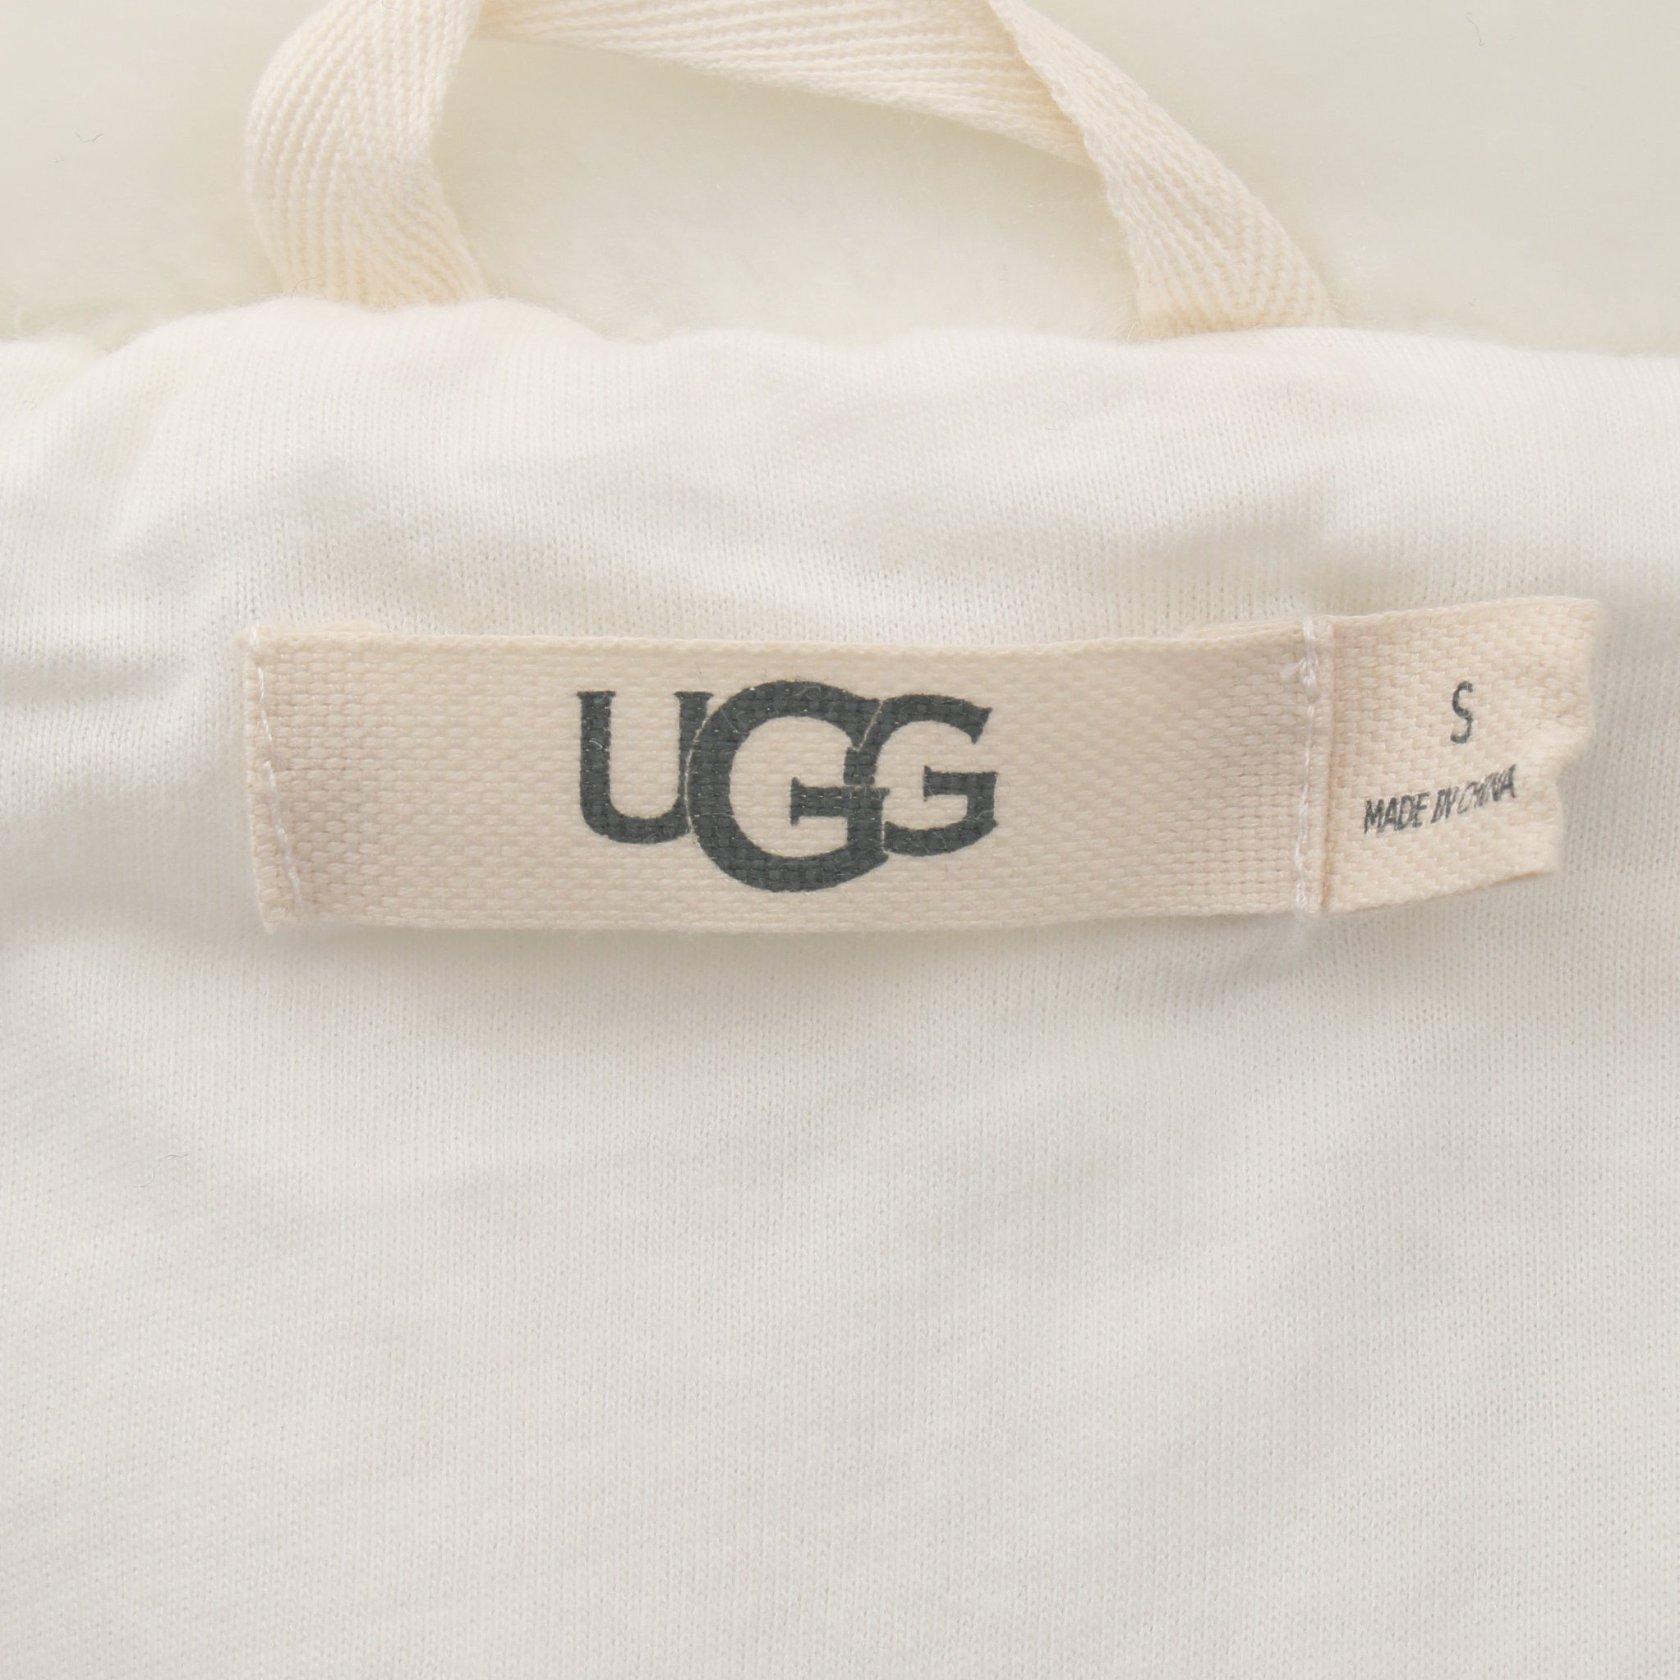 UGG australia・アウター・LAKEN レークン ジャケット ホワイト フェイクファー